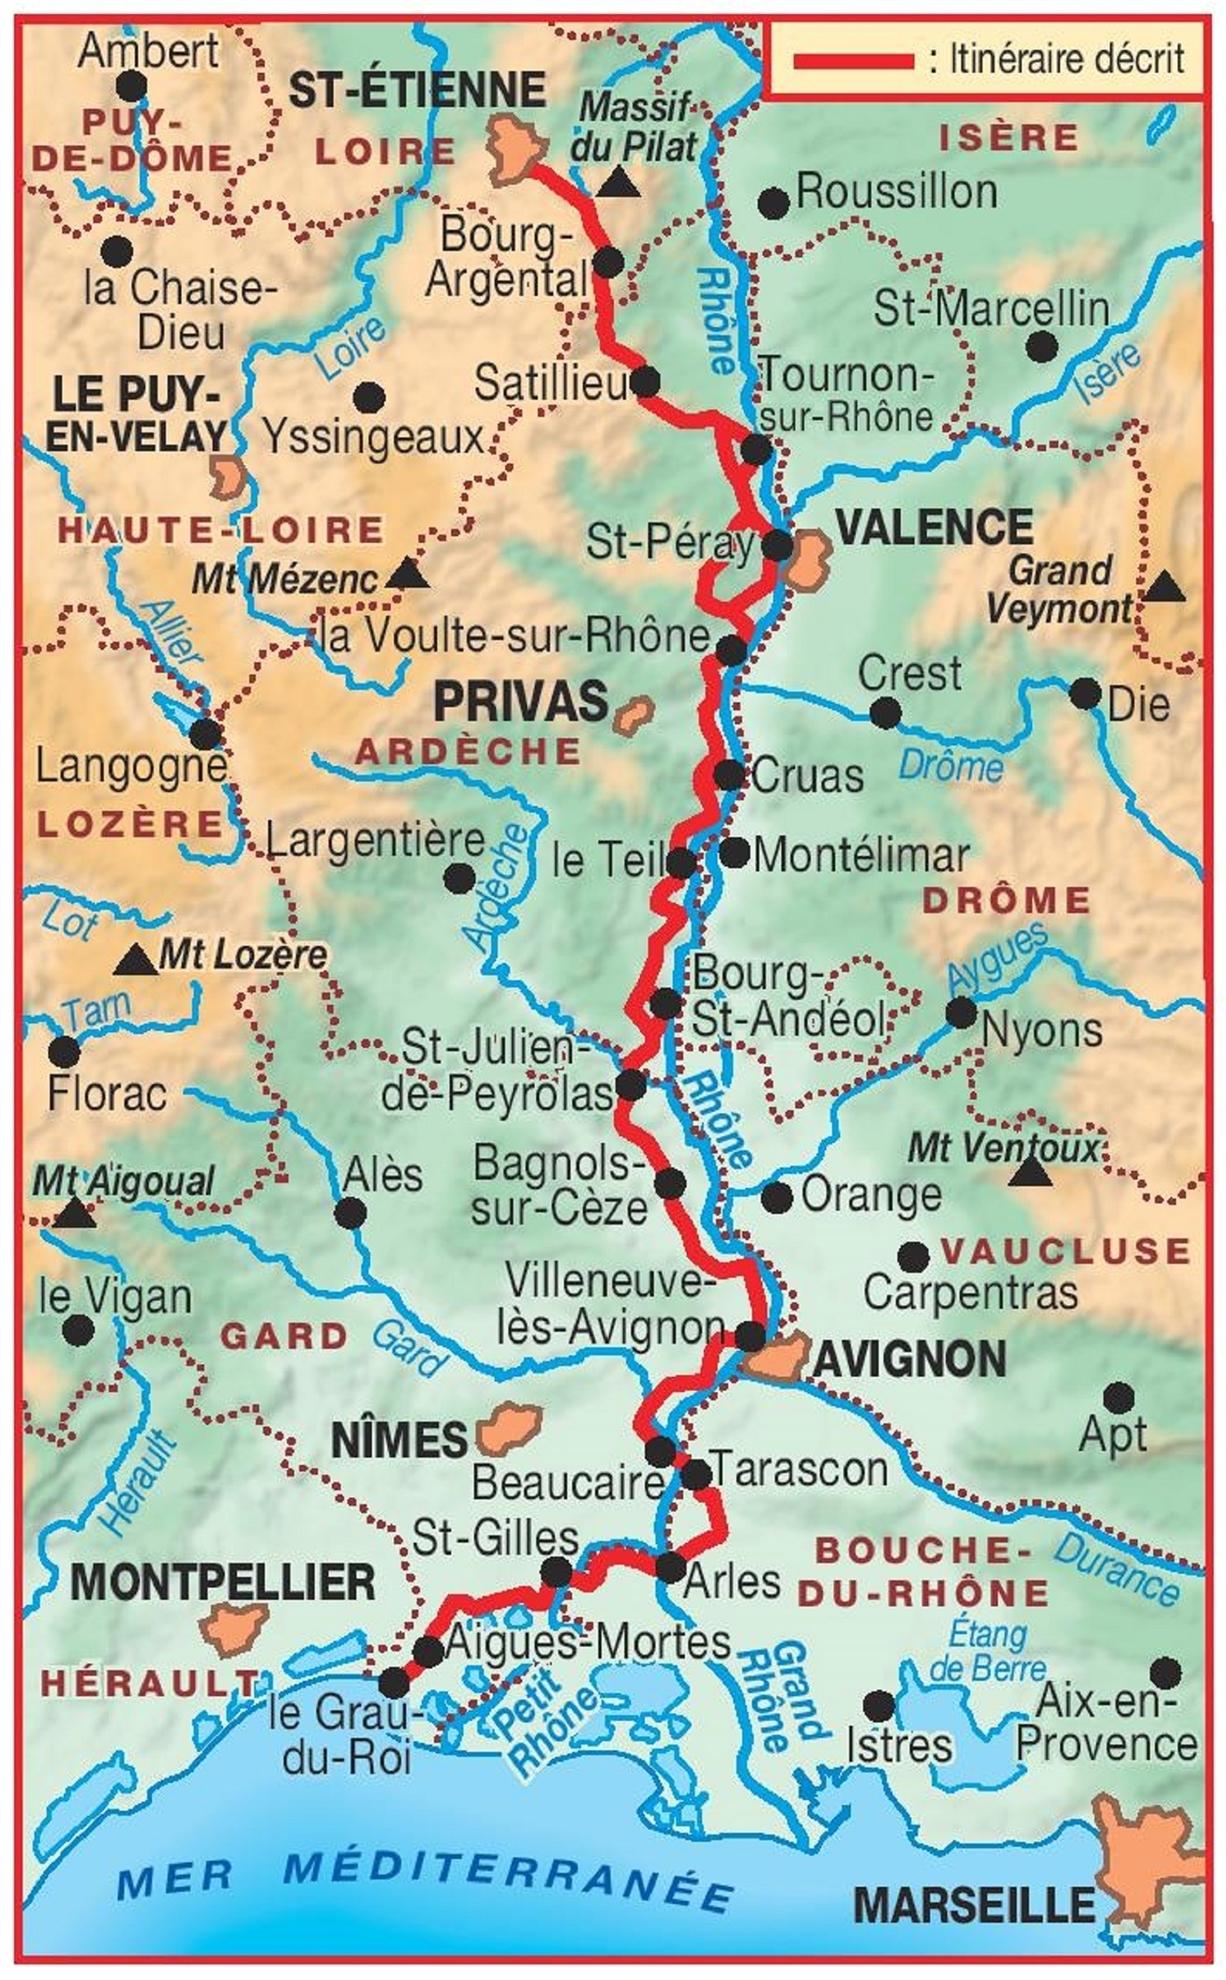 Carte Des Sentiers Du Pilat : carte, sentiers, pilat, Pilat, Méditerranée, Balcons, Rhône, Randonnée, Occitanie,, Pyrénées